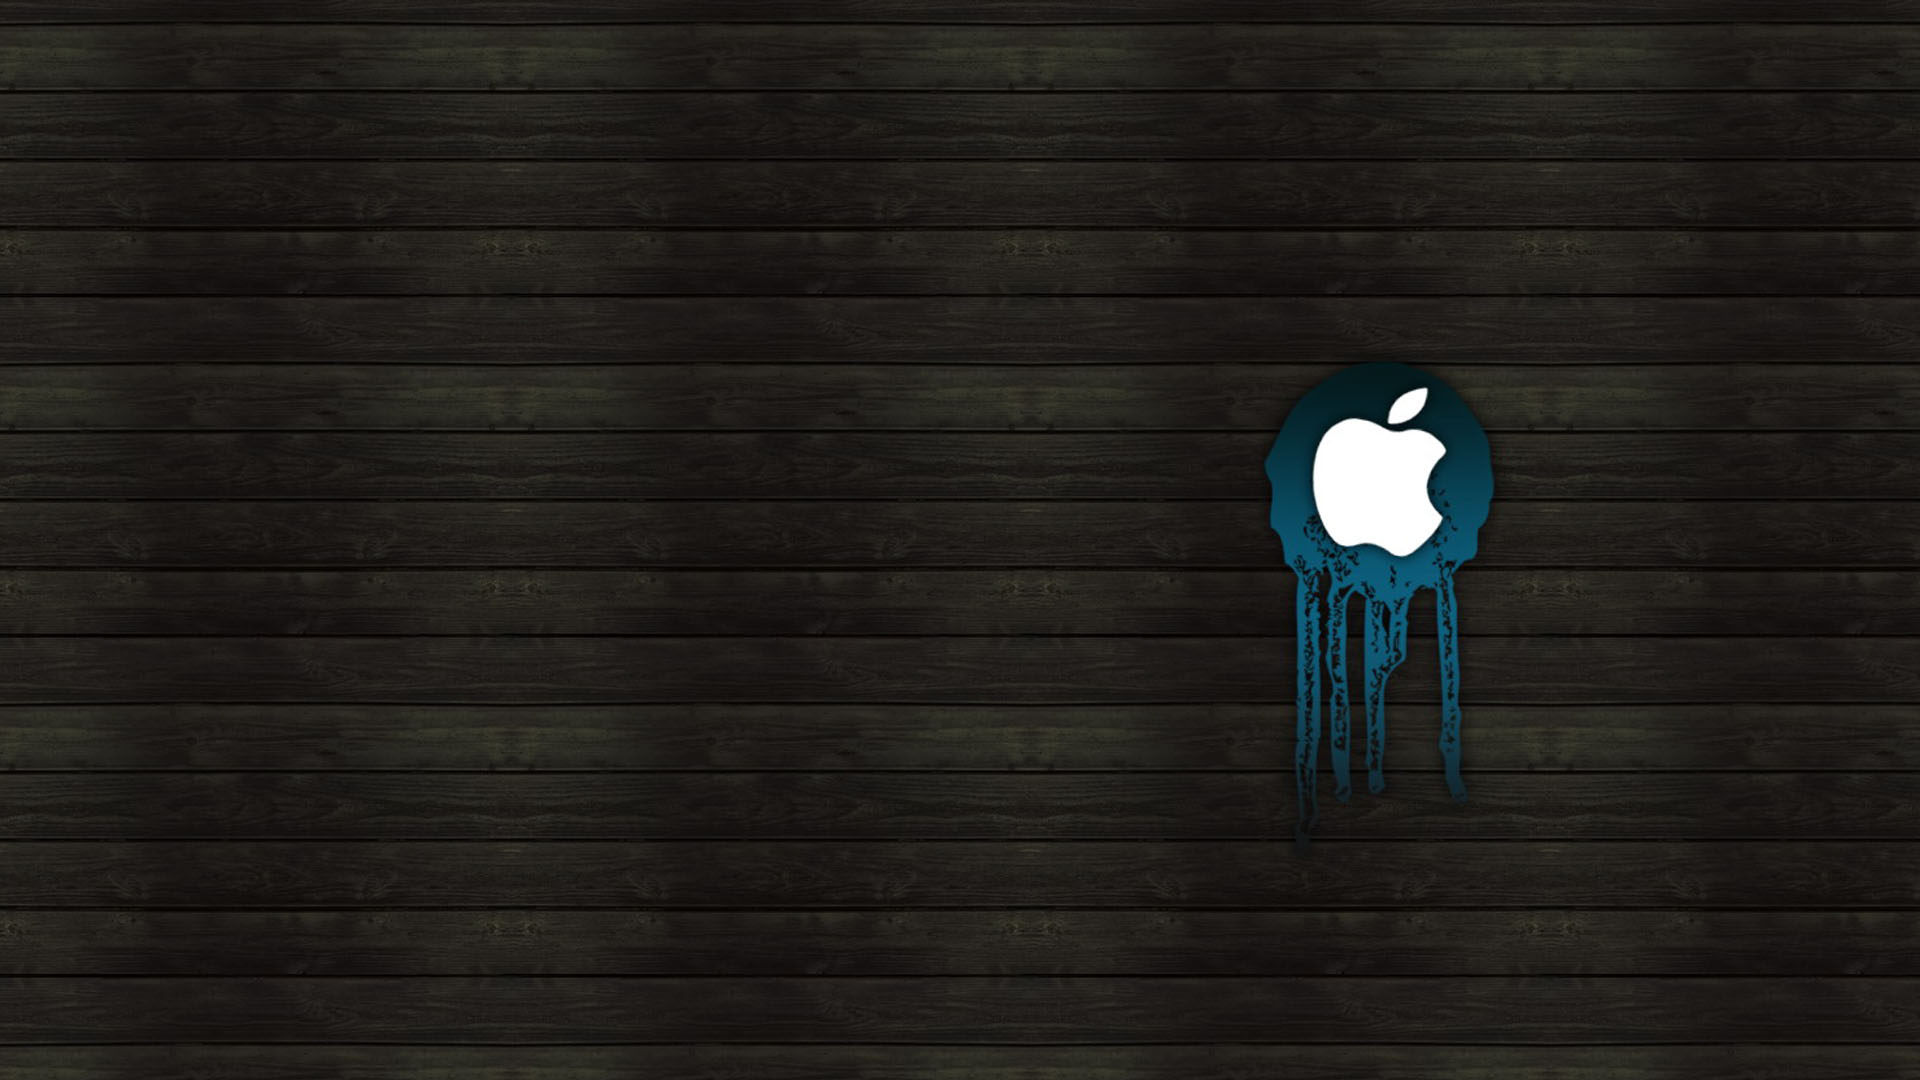 Wallpaper Think Different Quotes Hd Macbook Air Logo Wallpapers Pixelstalk Net